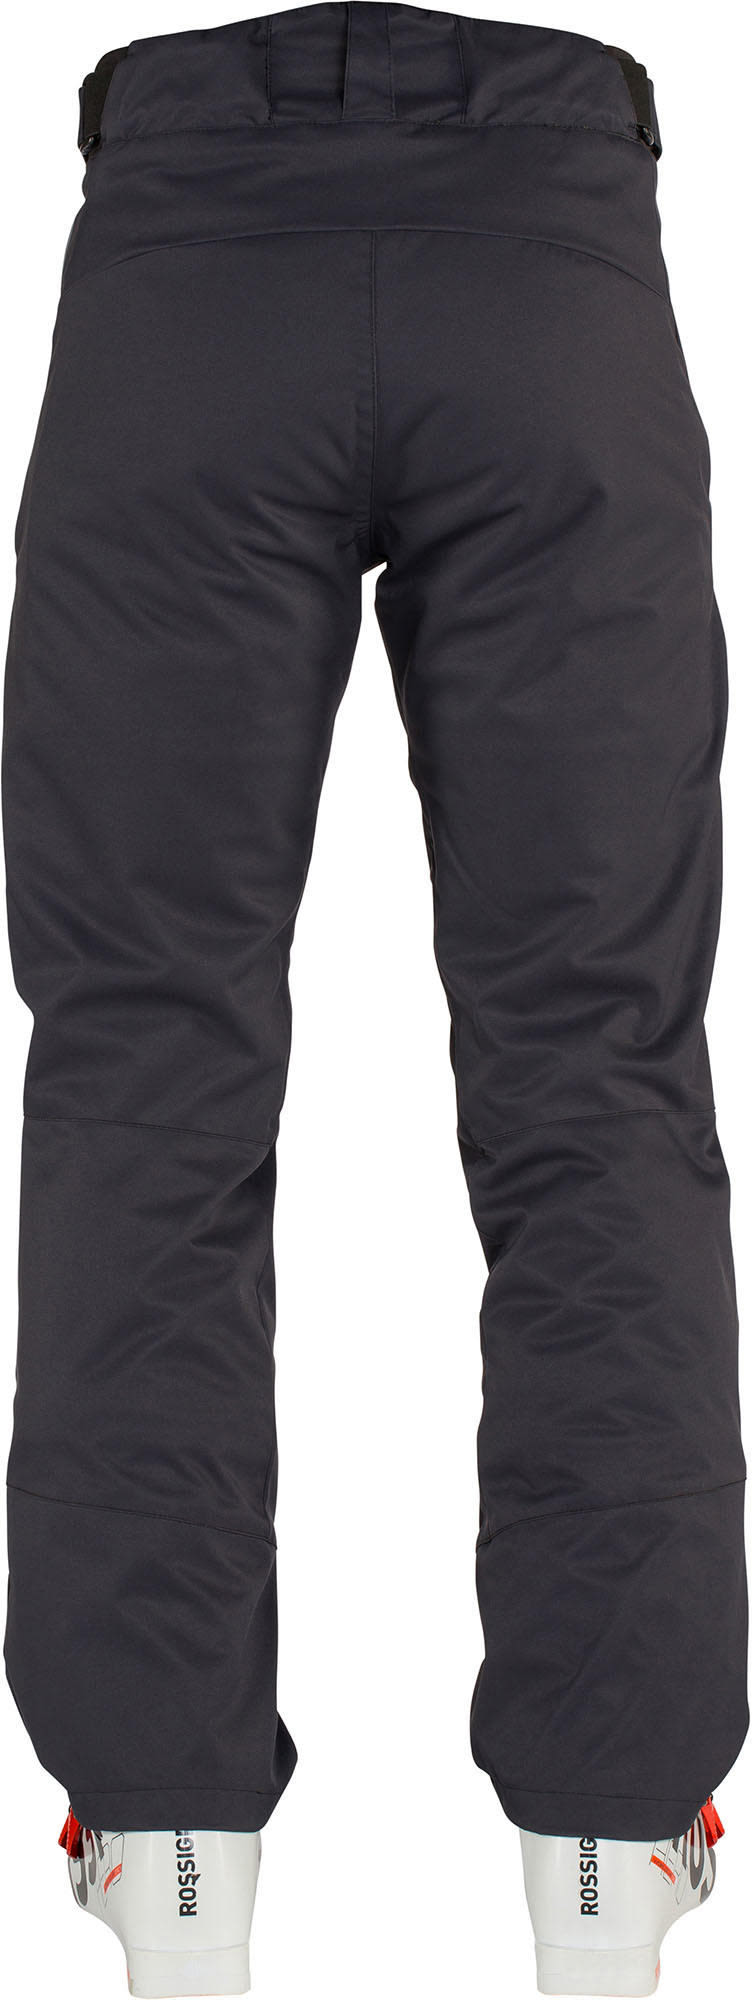 Rossignol Ski Pants - thumbnail 2 9830eda80